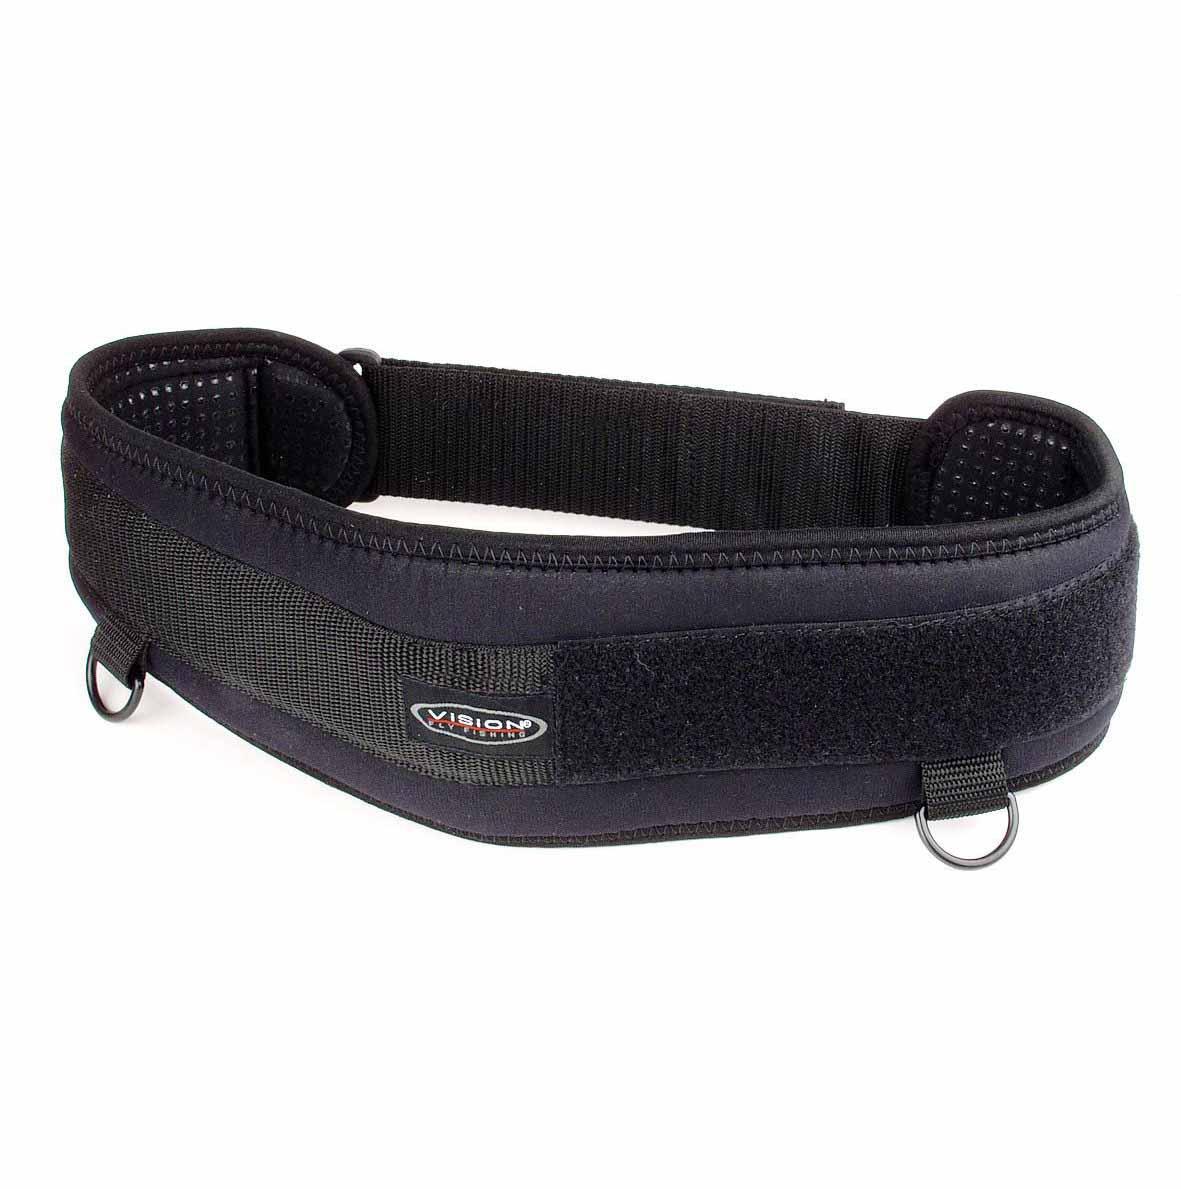 Cinturon Lumbar para vadeador Vision